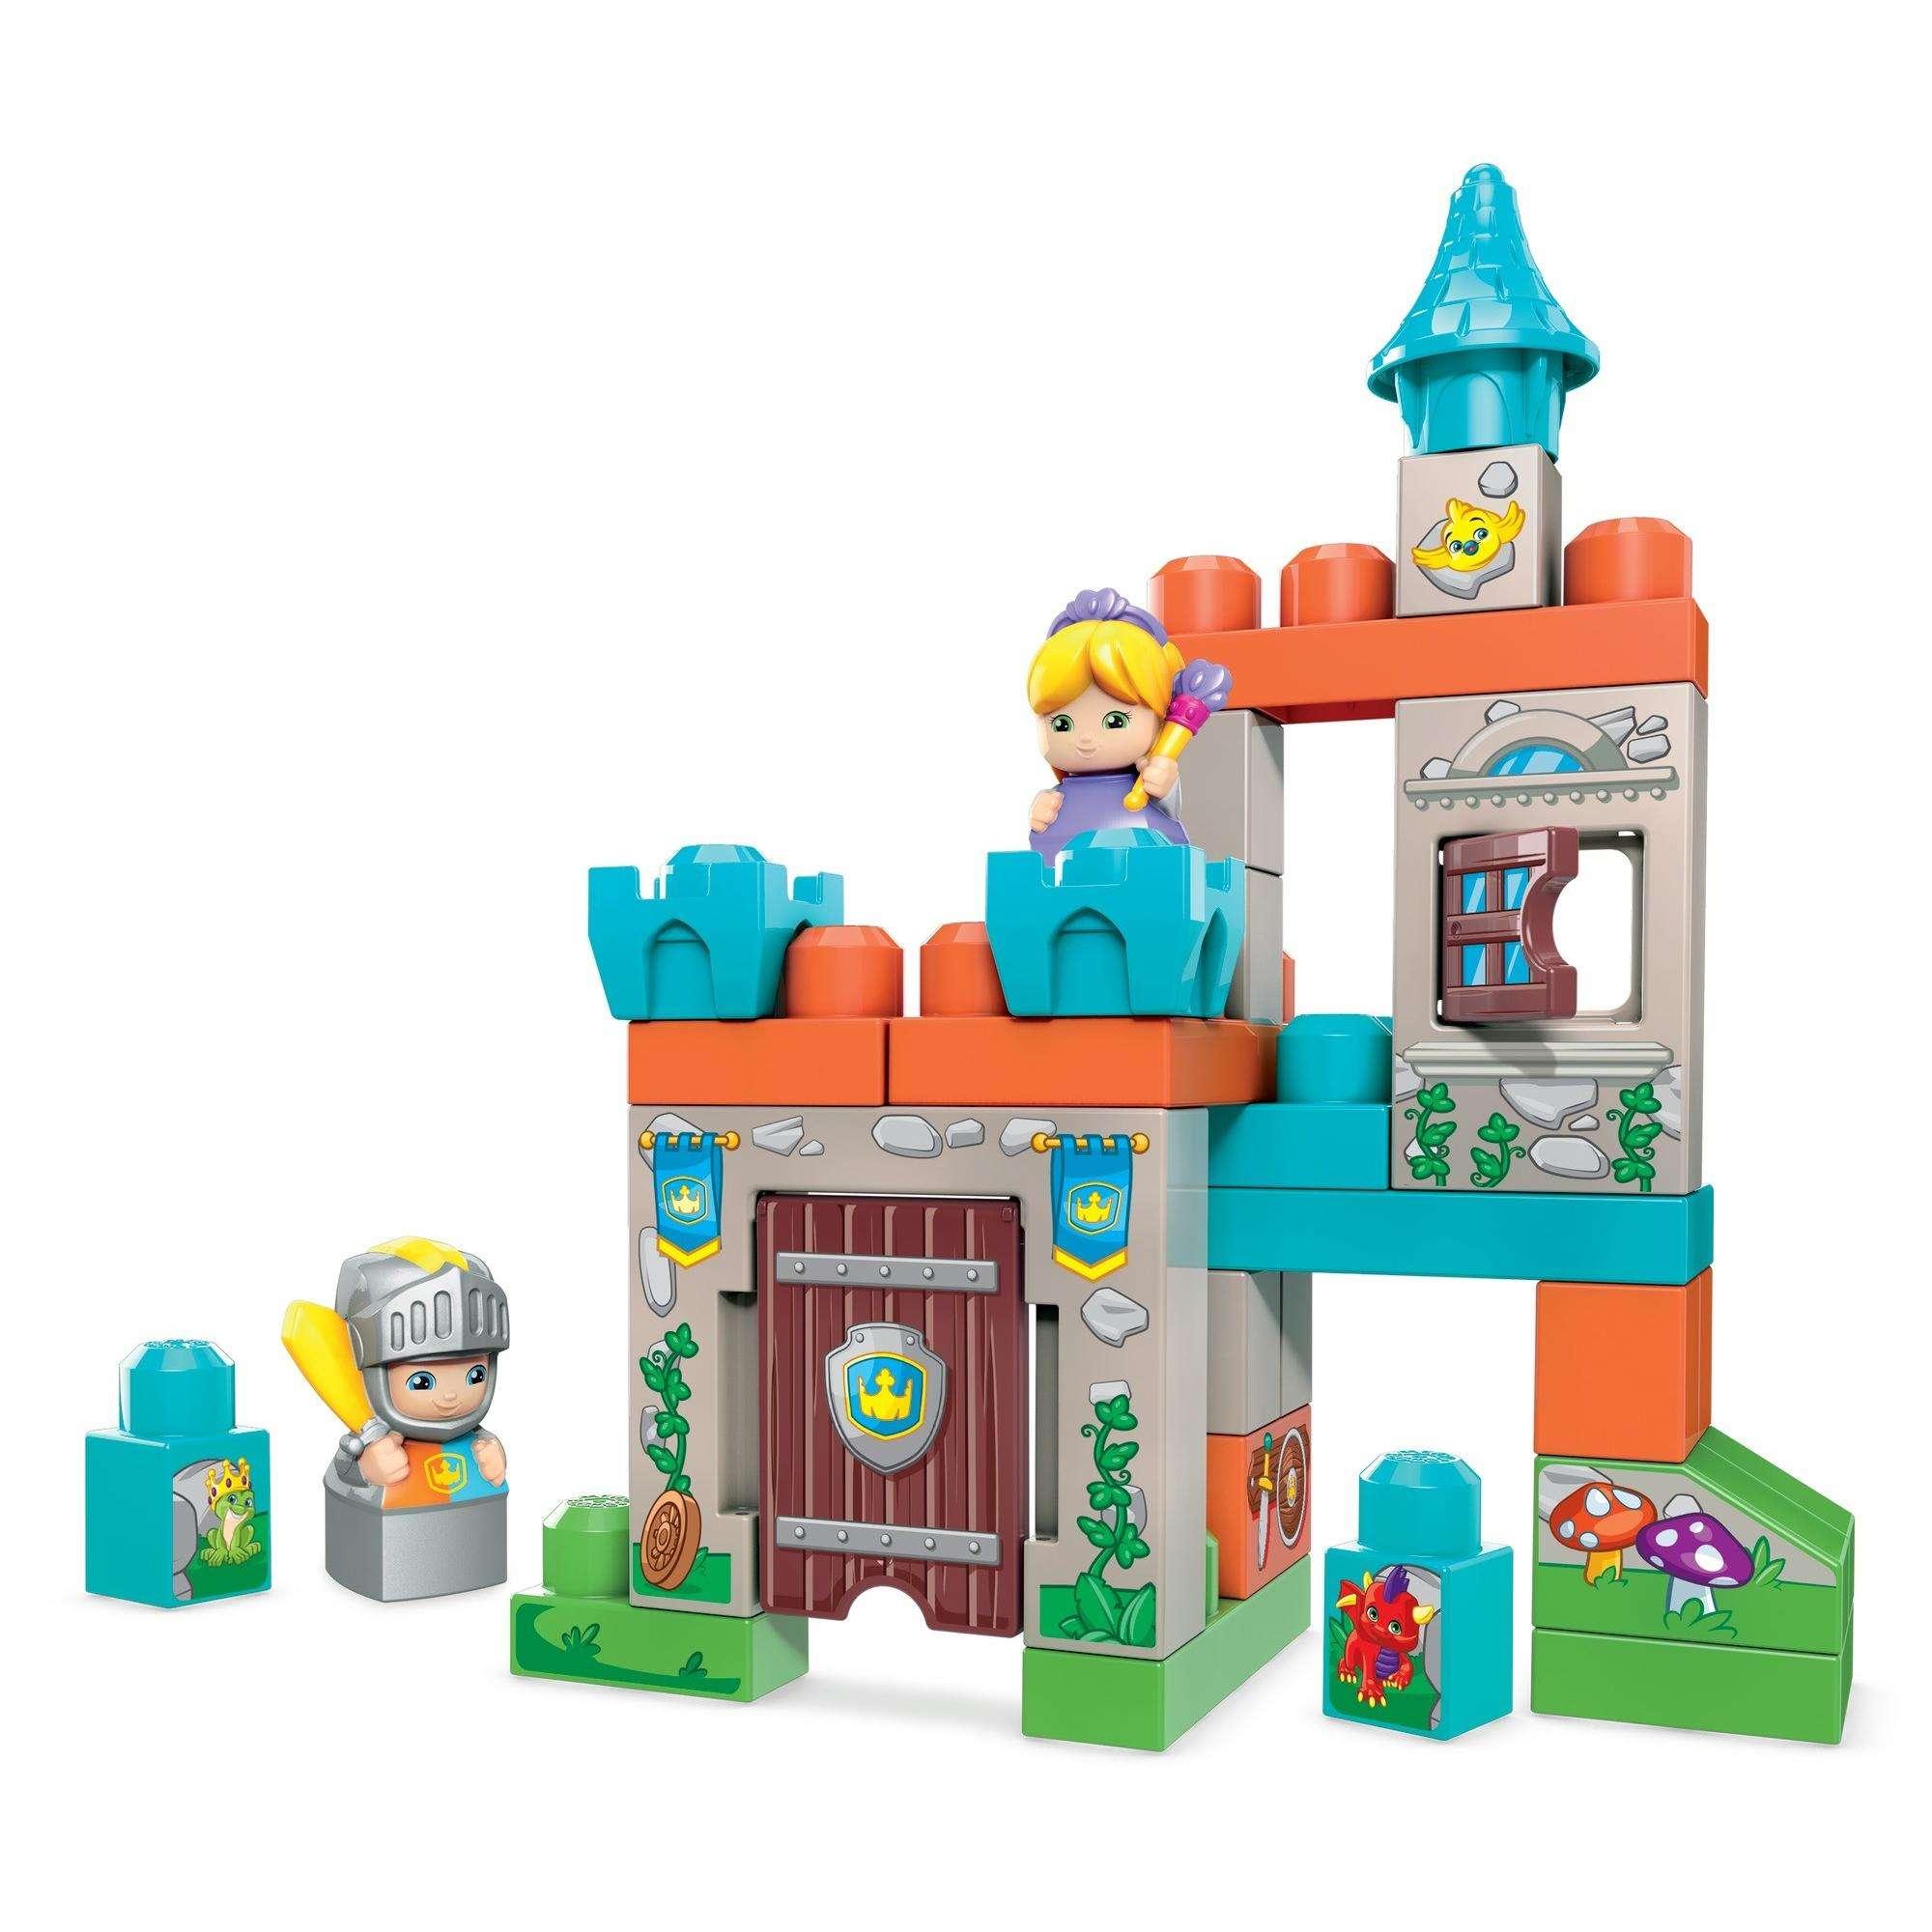 30-Piece Mega Bloks Storytelling Royal Castle $17, Mega Bloks John Deere Lil' Tractor $7.50 & More + Free Shipping w/ Walmart+ or $35+